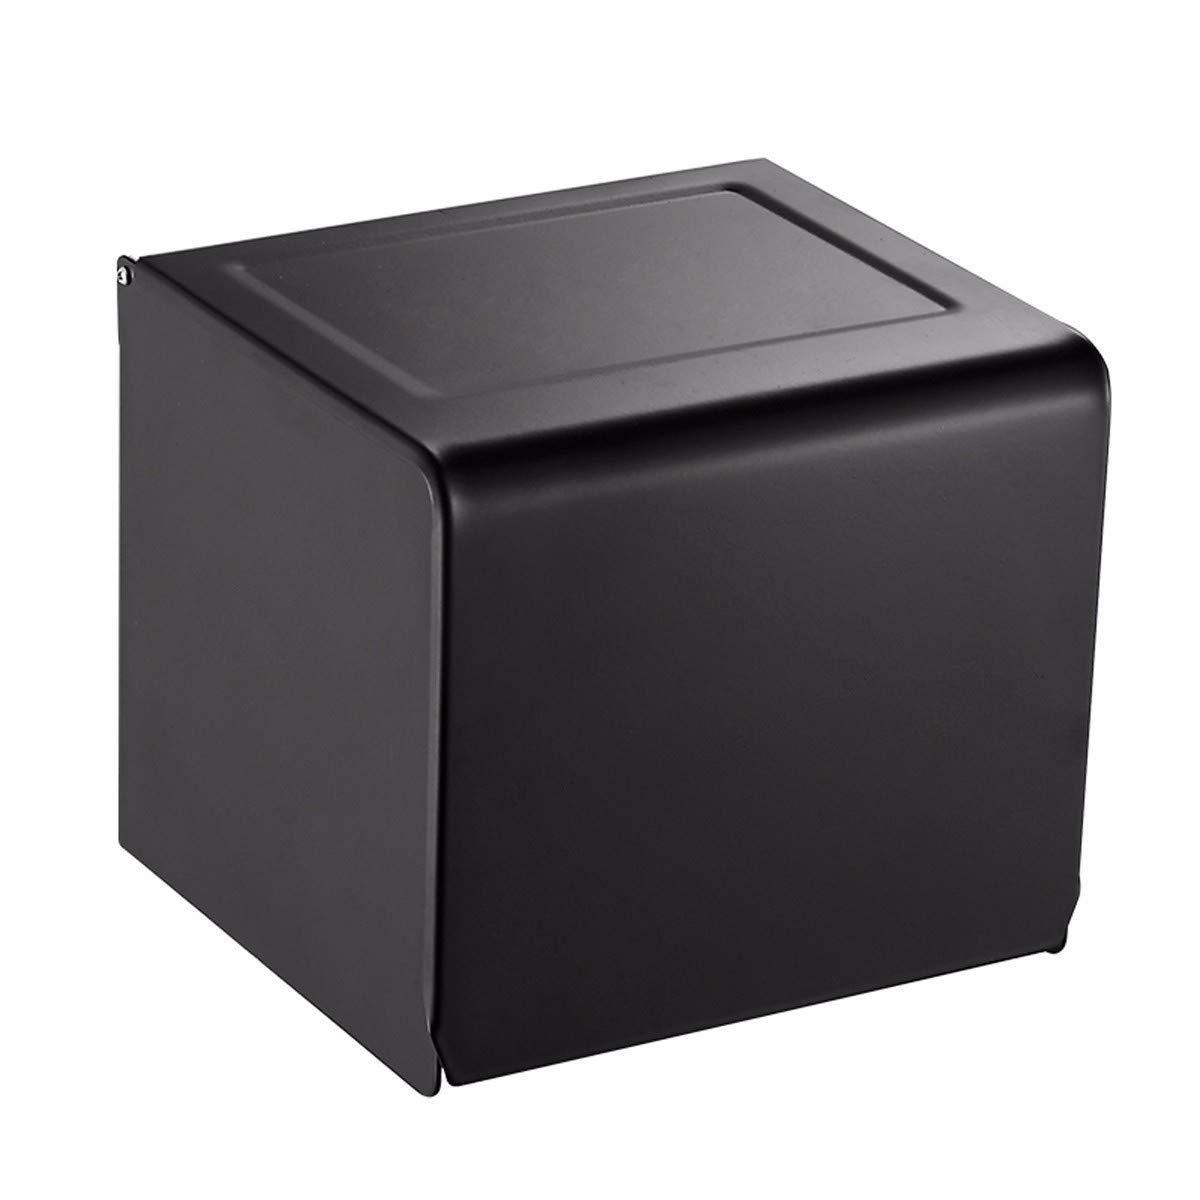 FYERBU-Non Perforated Black Toilet Paper Box Roll Paper Holder Tissue Box Towel Rack Toilet Paper Box Bathroom Rack.